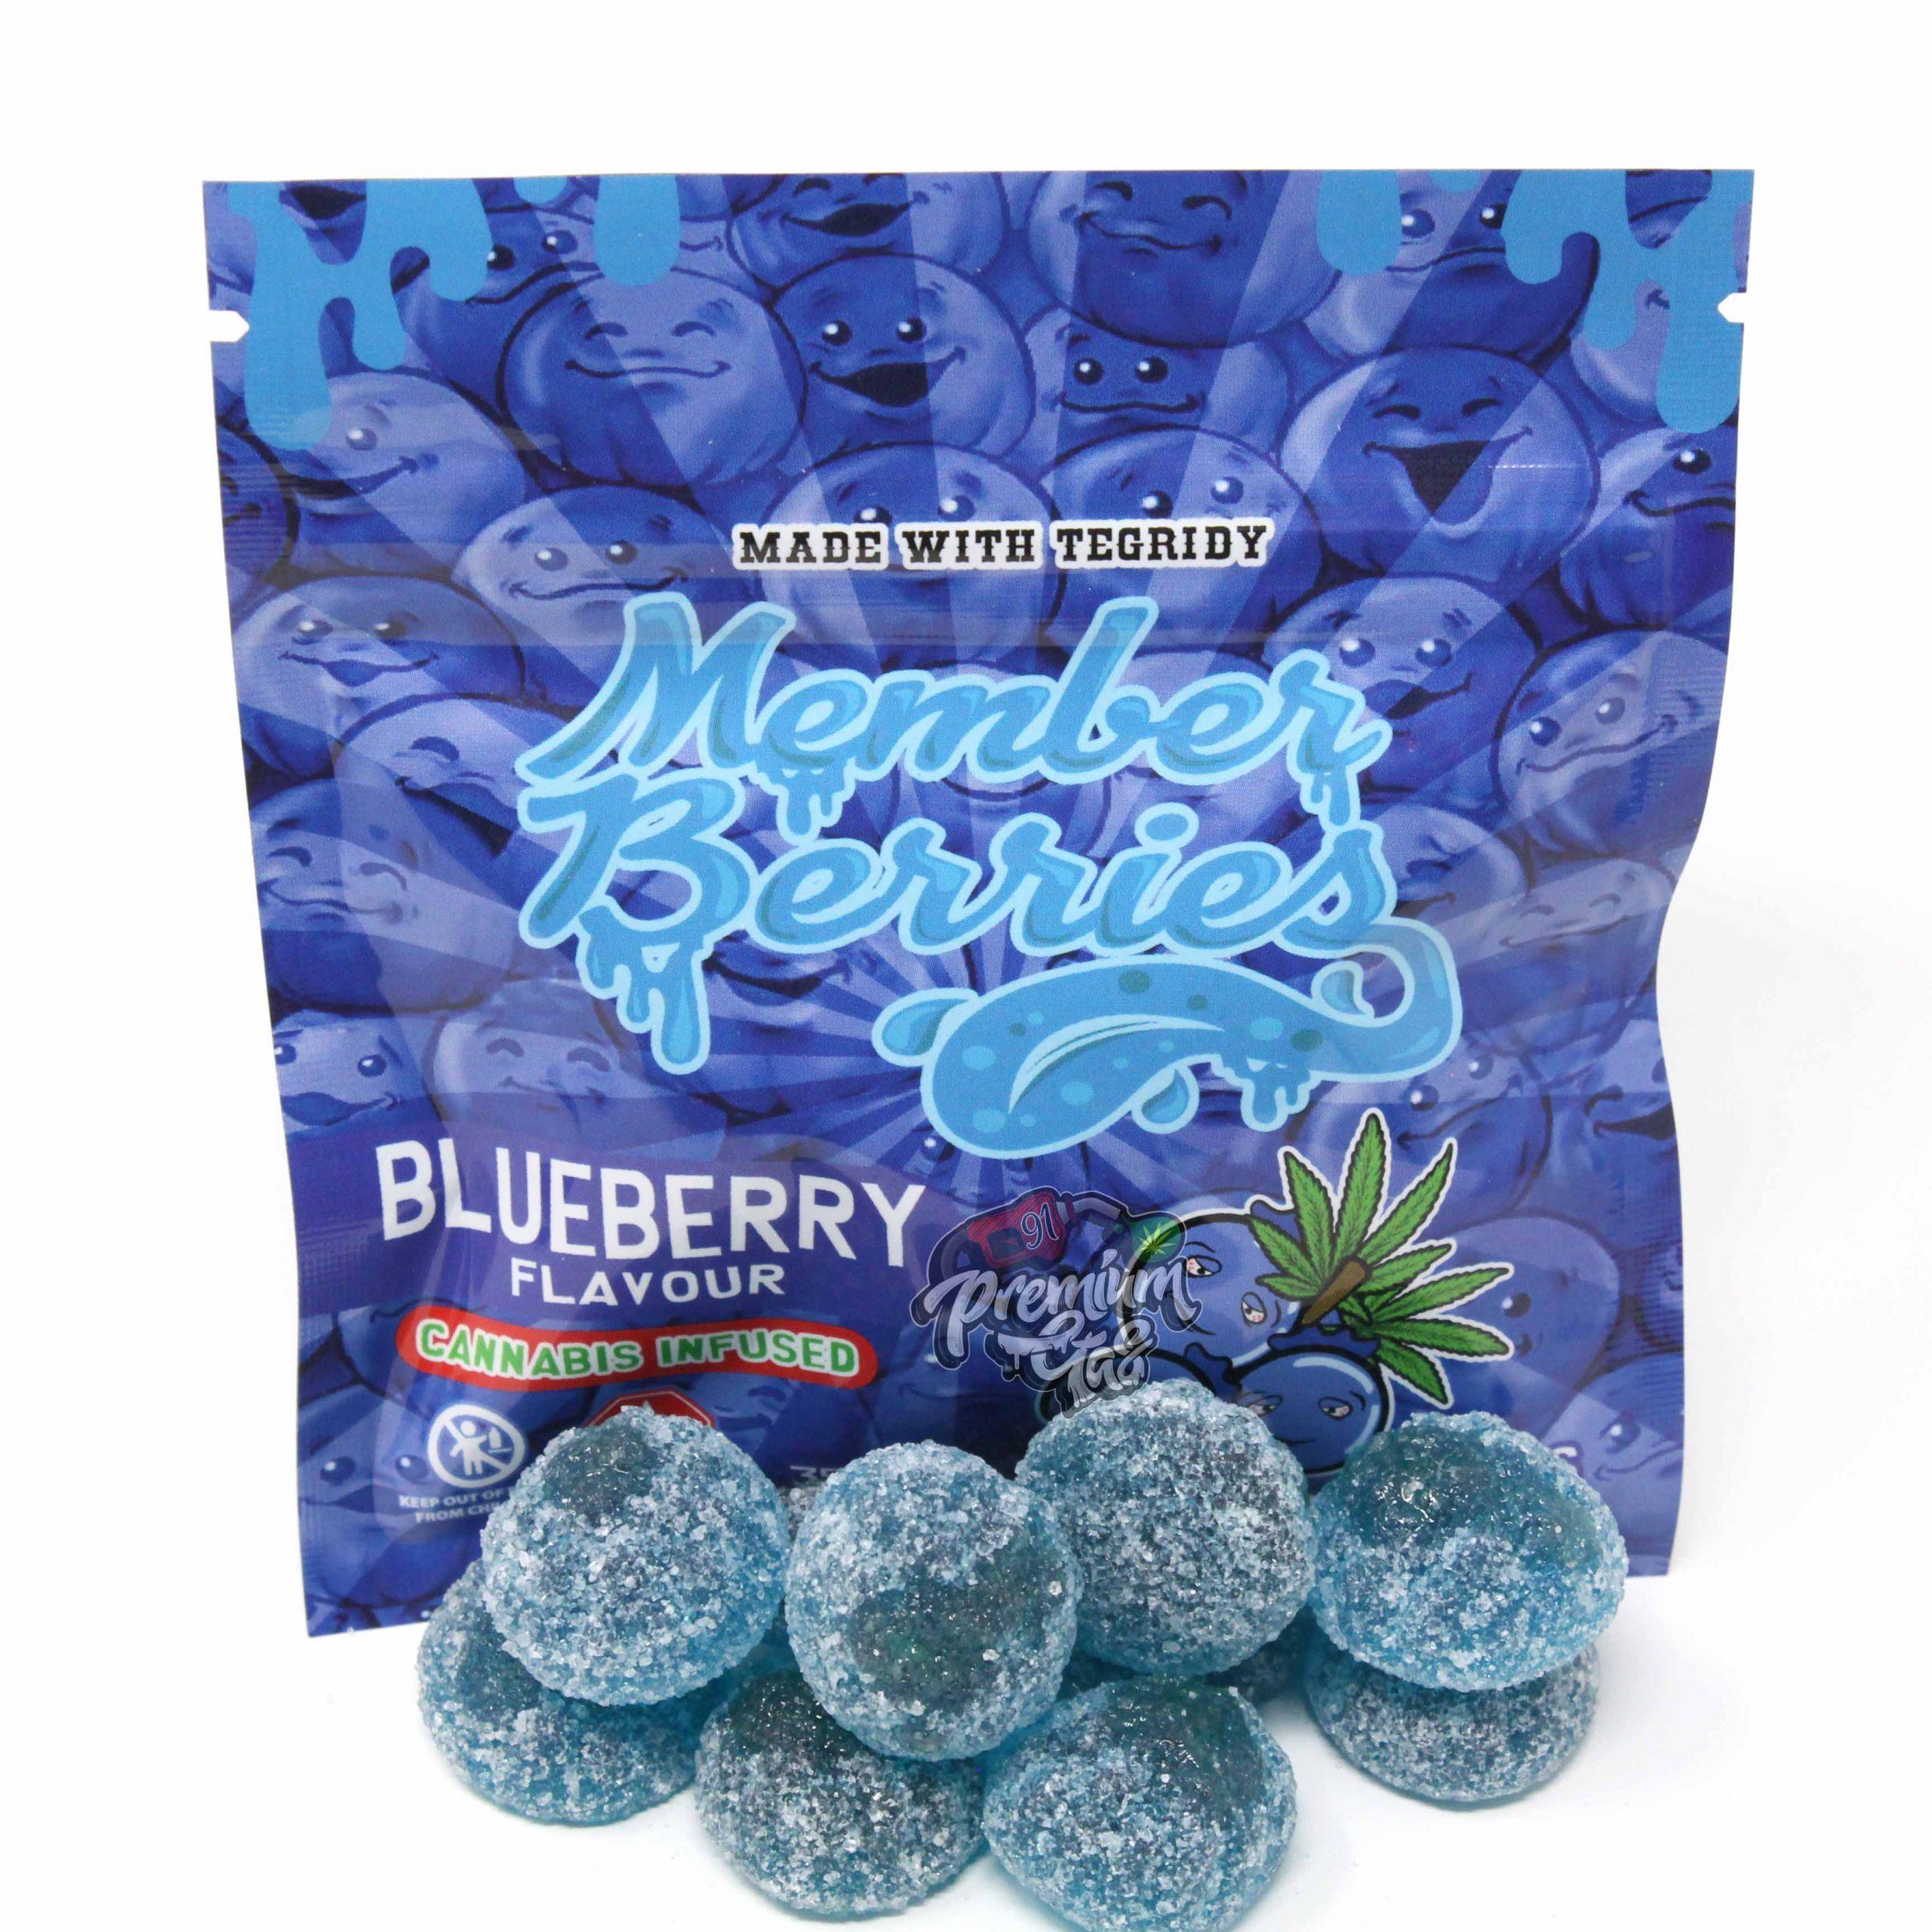 Member Berries – Blueberry 350mg